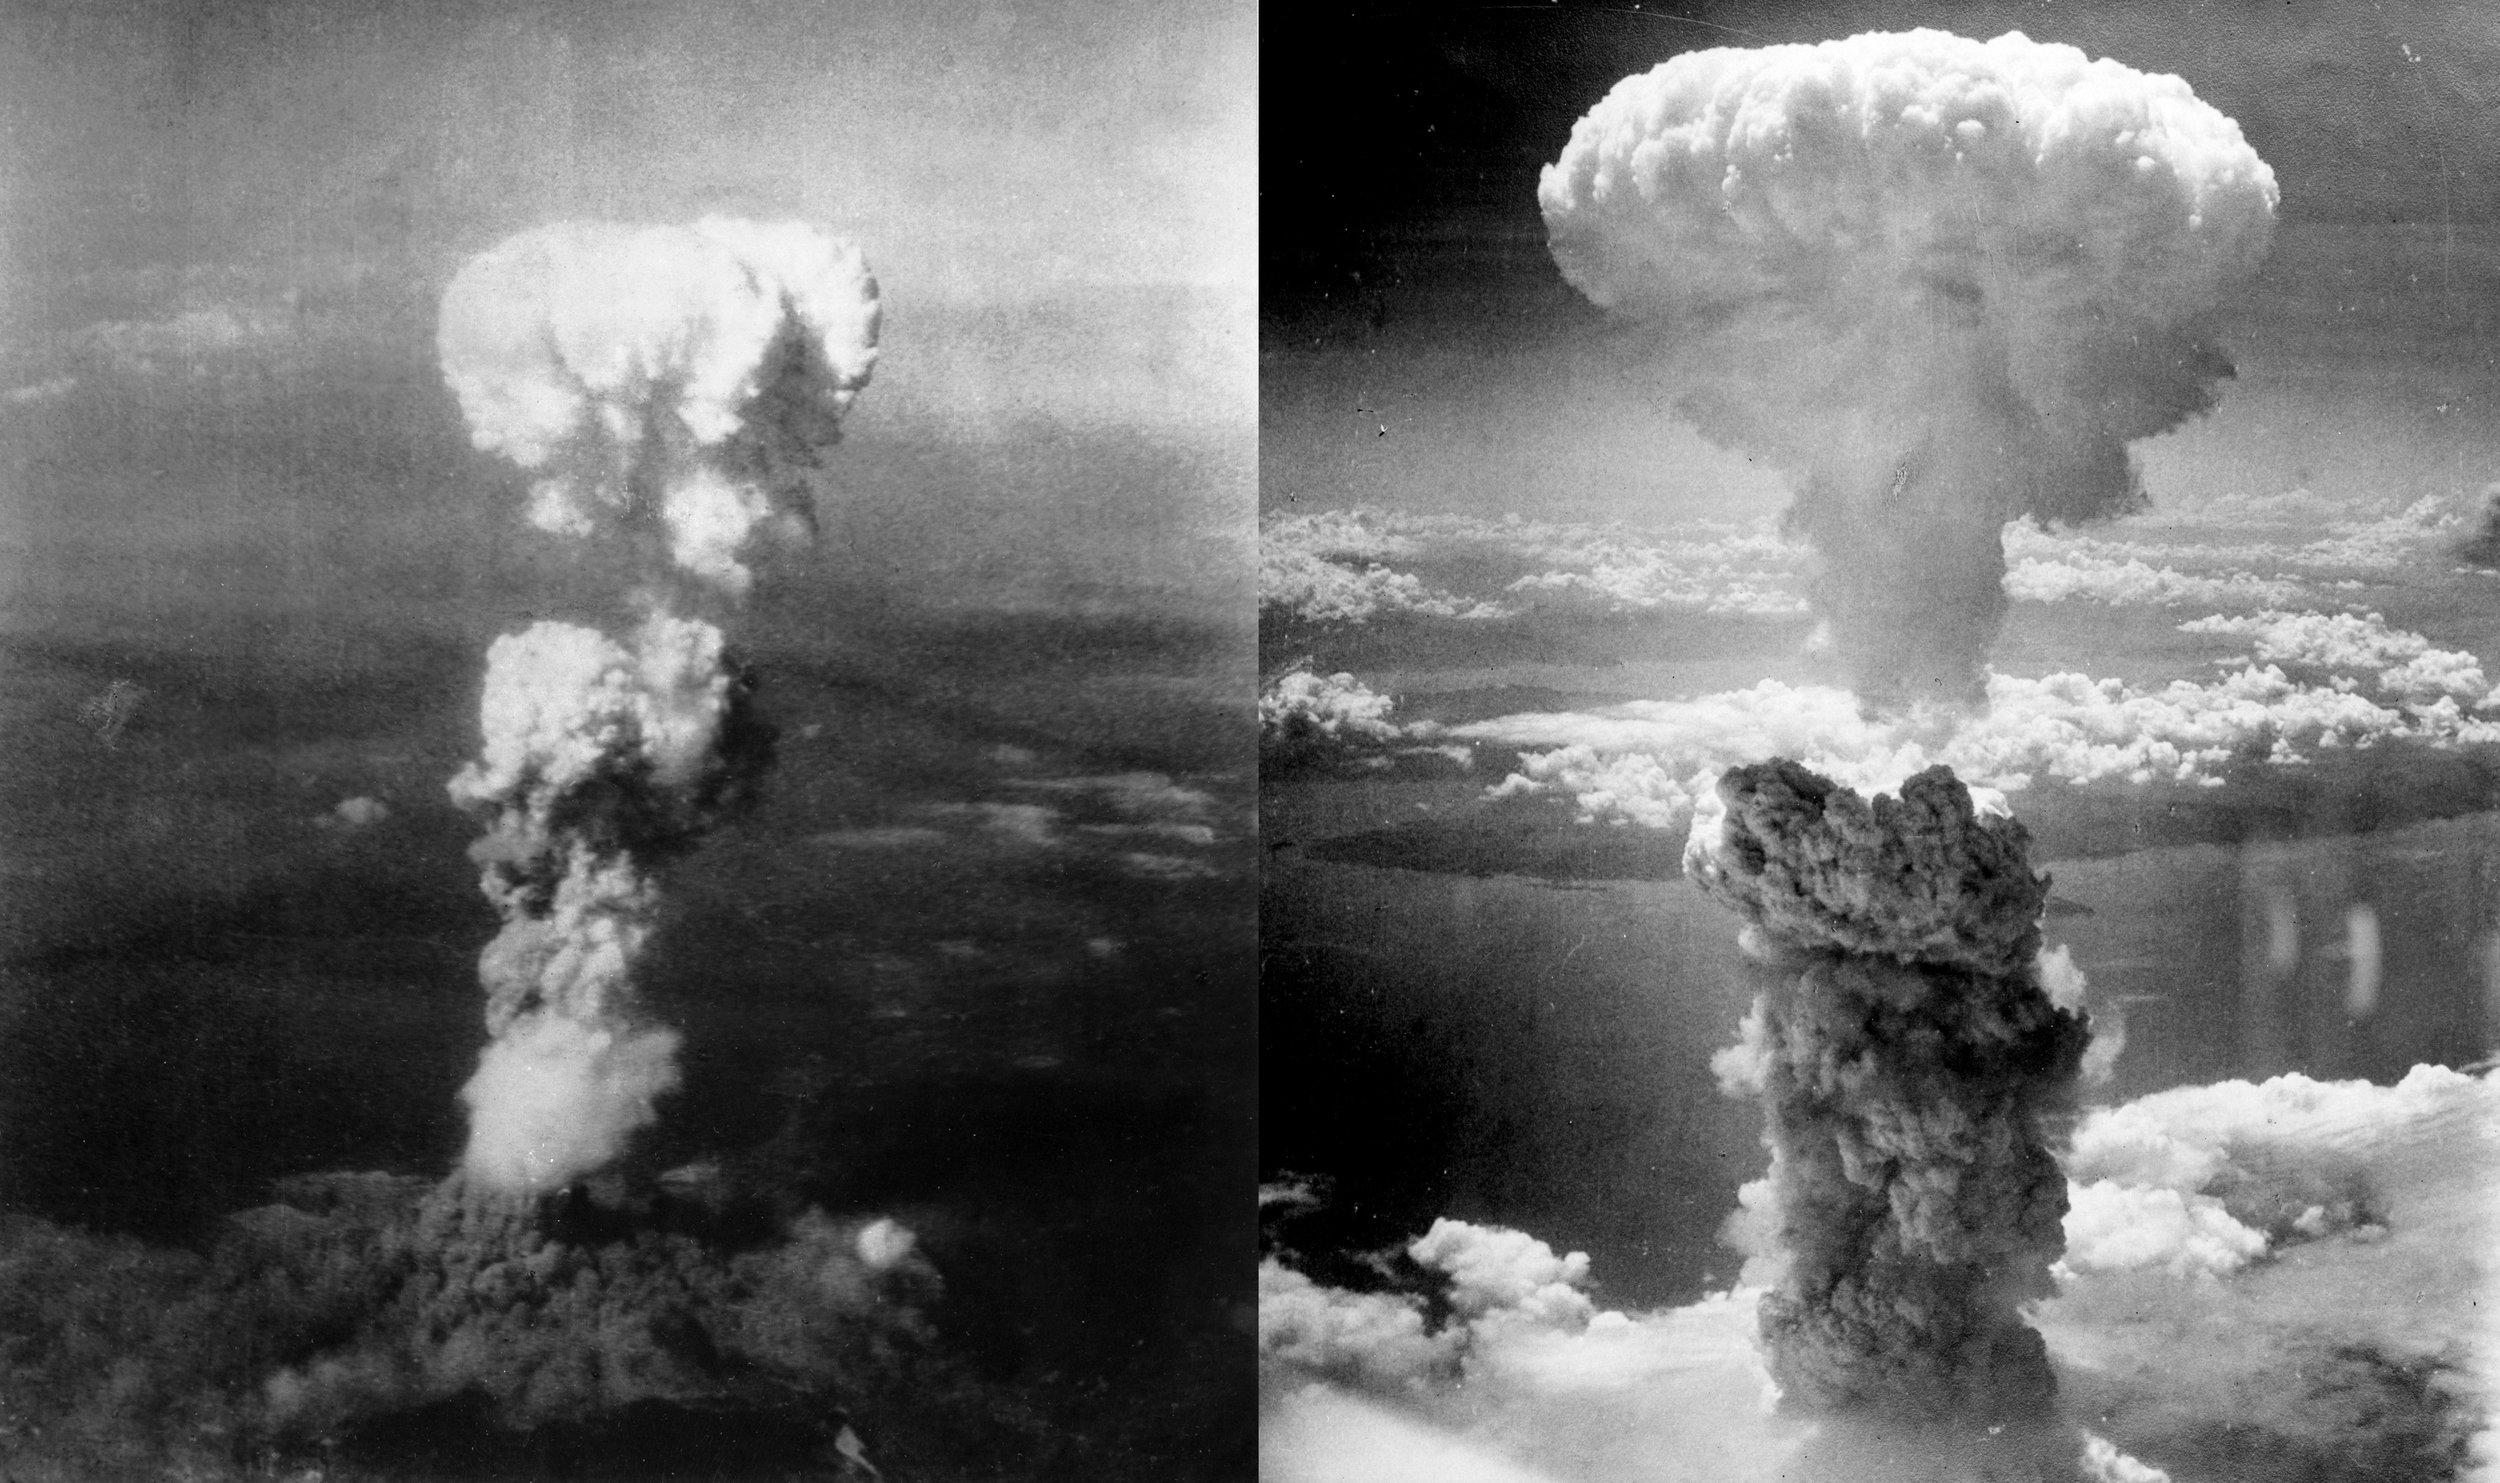 Left: Atomic bombing on Hiroshima on August 6, 1945. Right:Atomic bombing of Nagasaki on August 9, 1945. (Wikimedia)